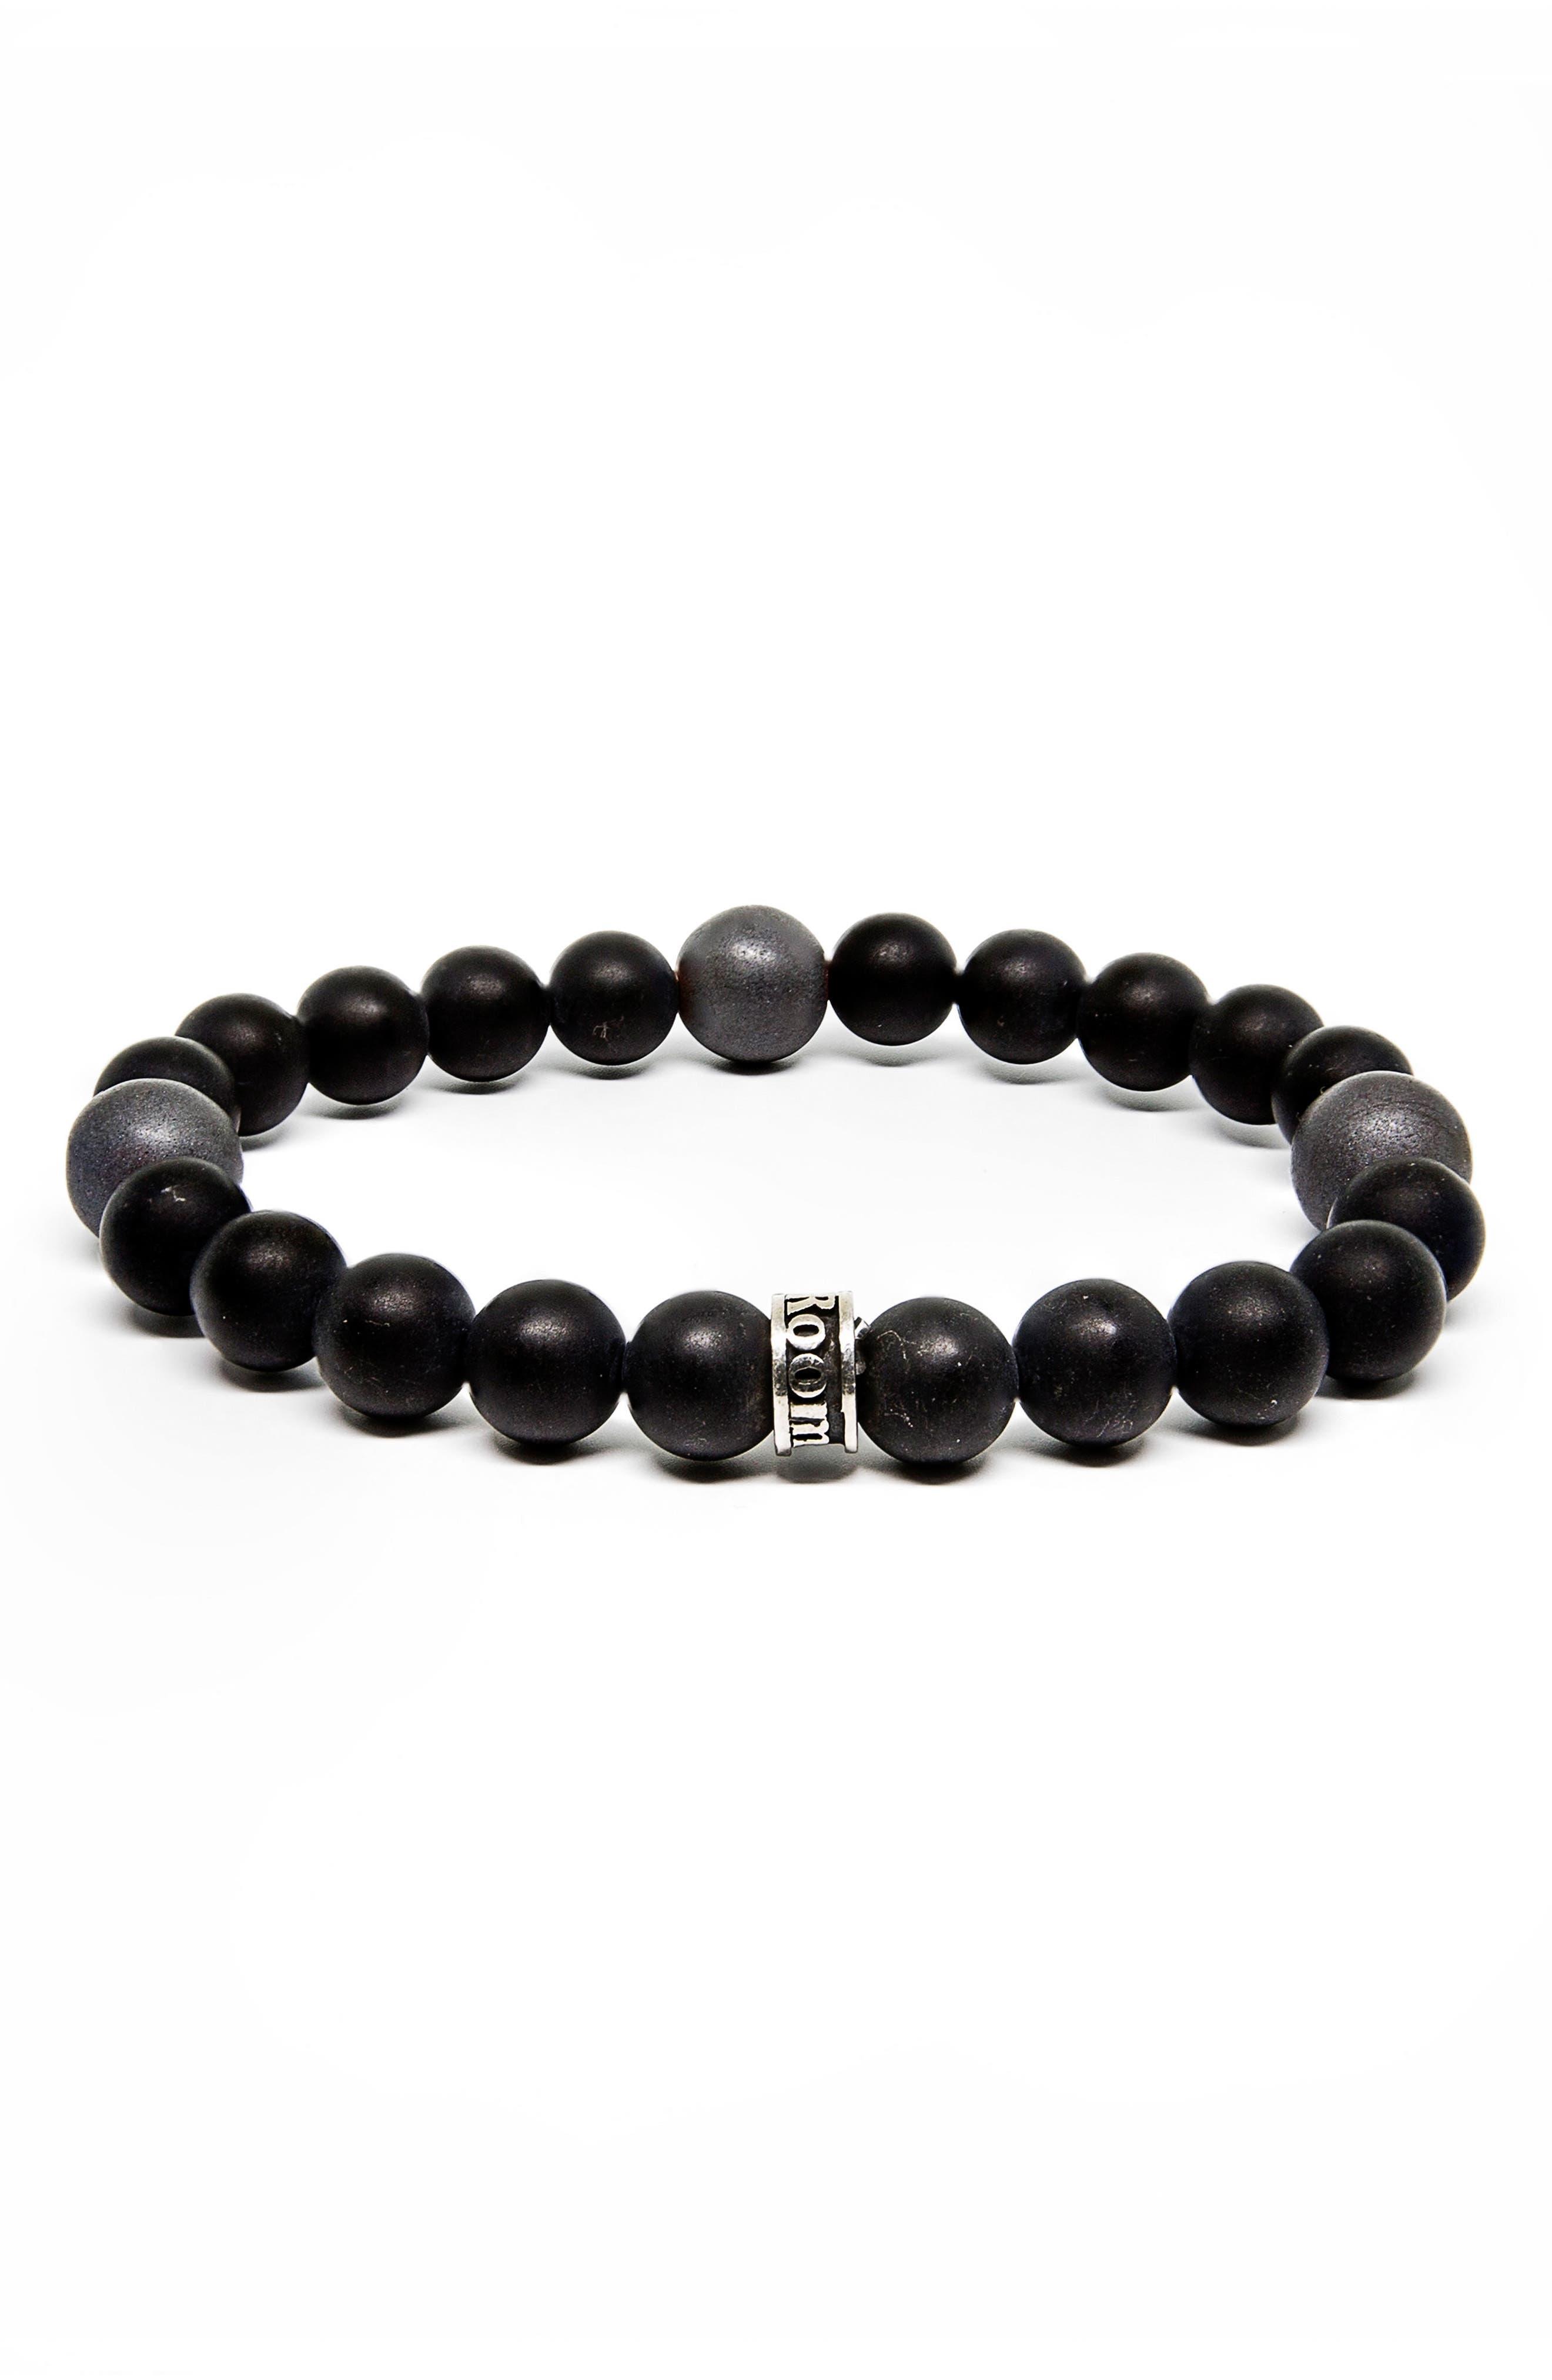 Satin Agate and Hematite Stretch Bracelet,                         Main,                         color, Black/ Gray